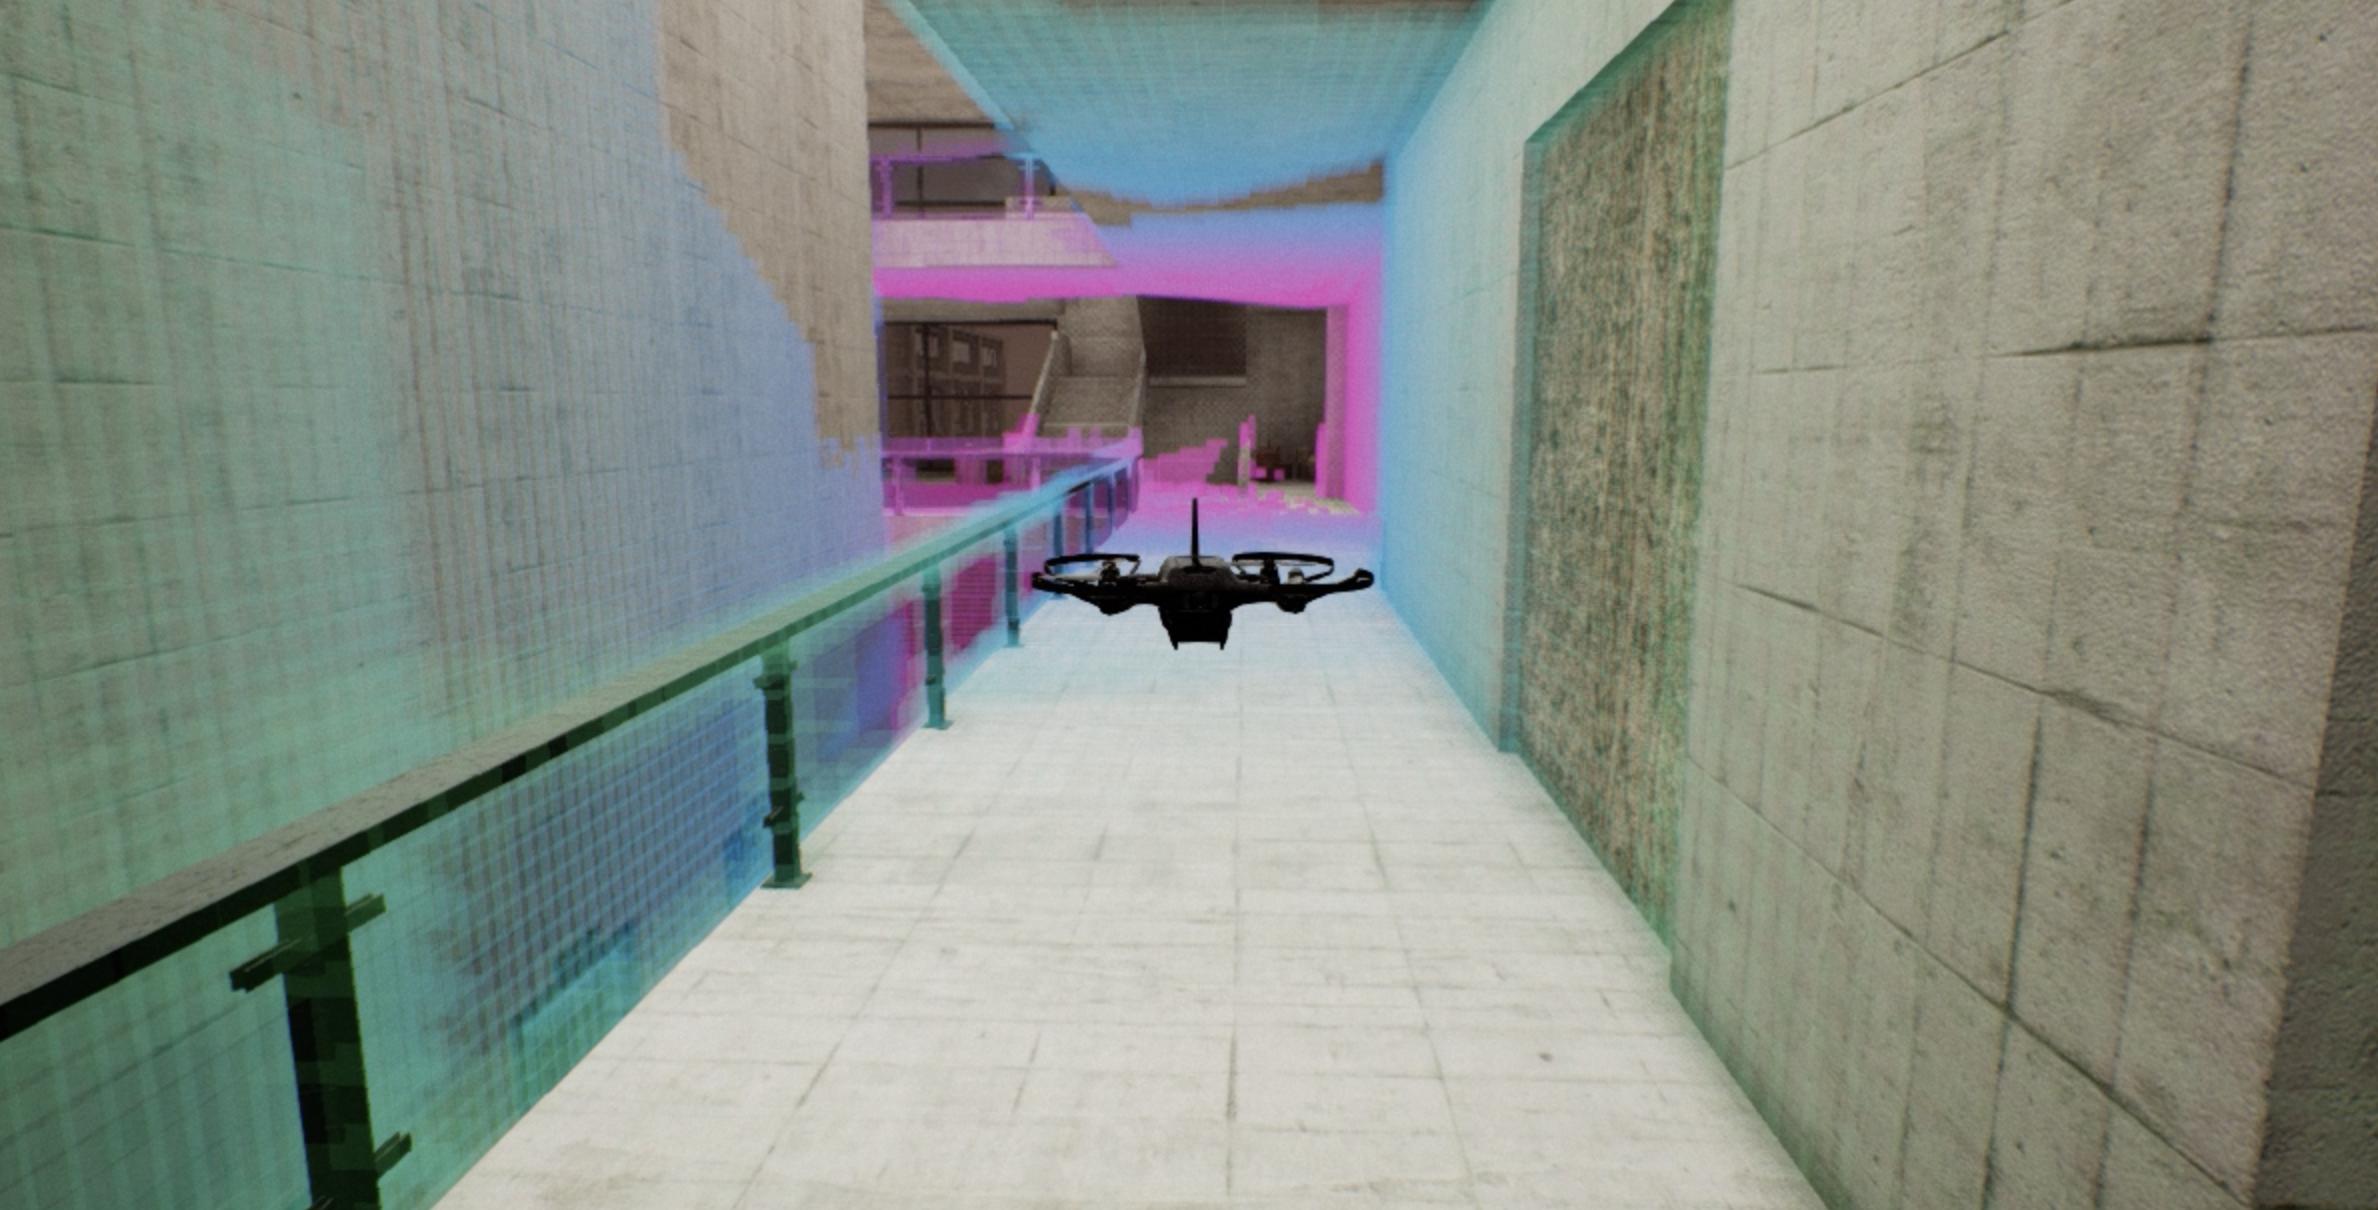 Nova in Simulated Environment